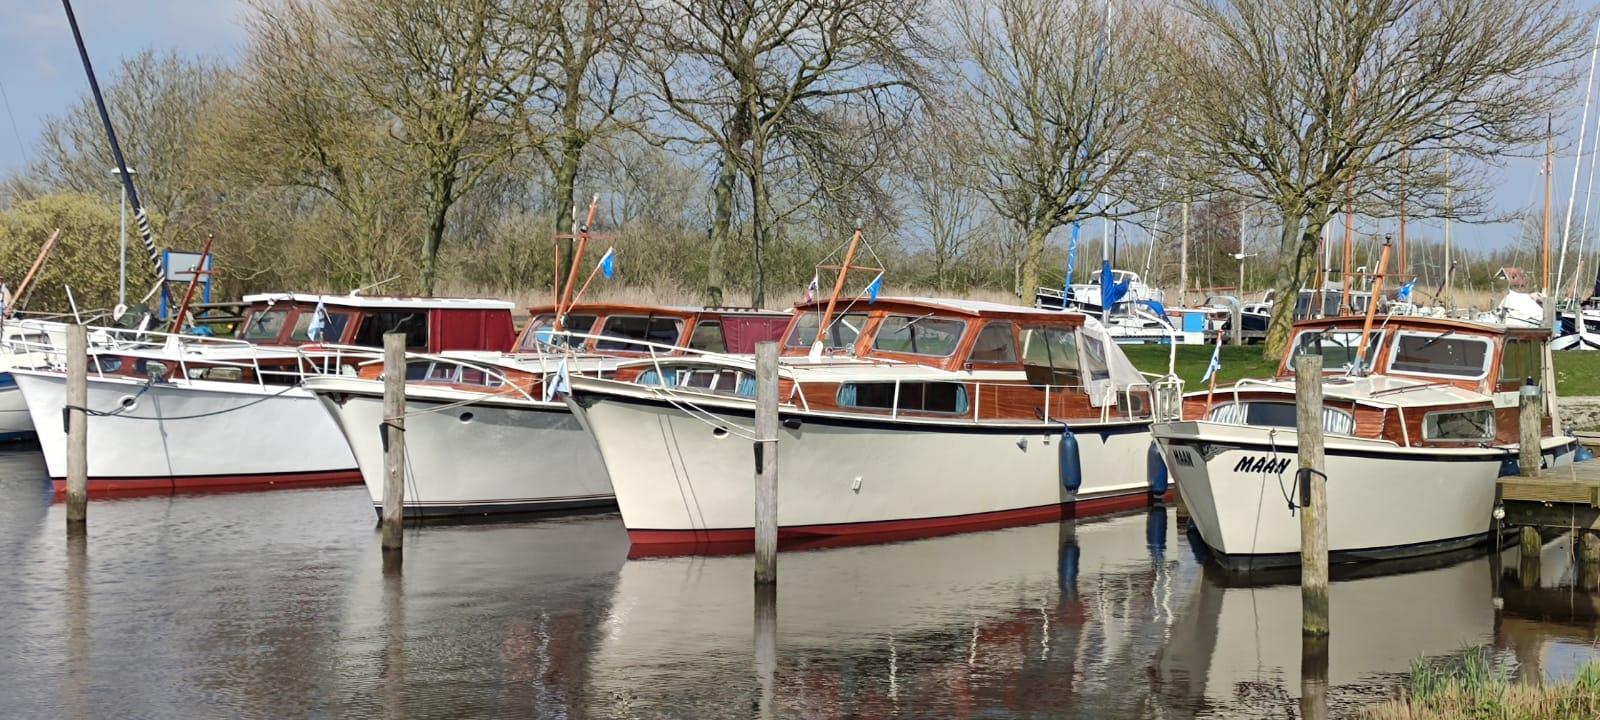 Boot huren in Friesland - Jachthaven Lunegat